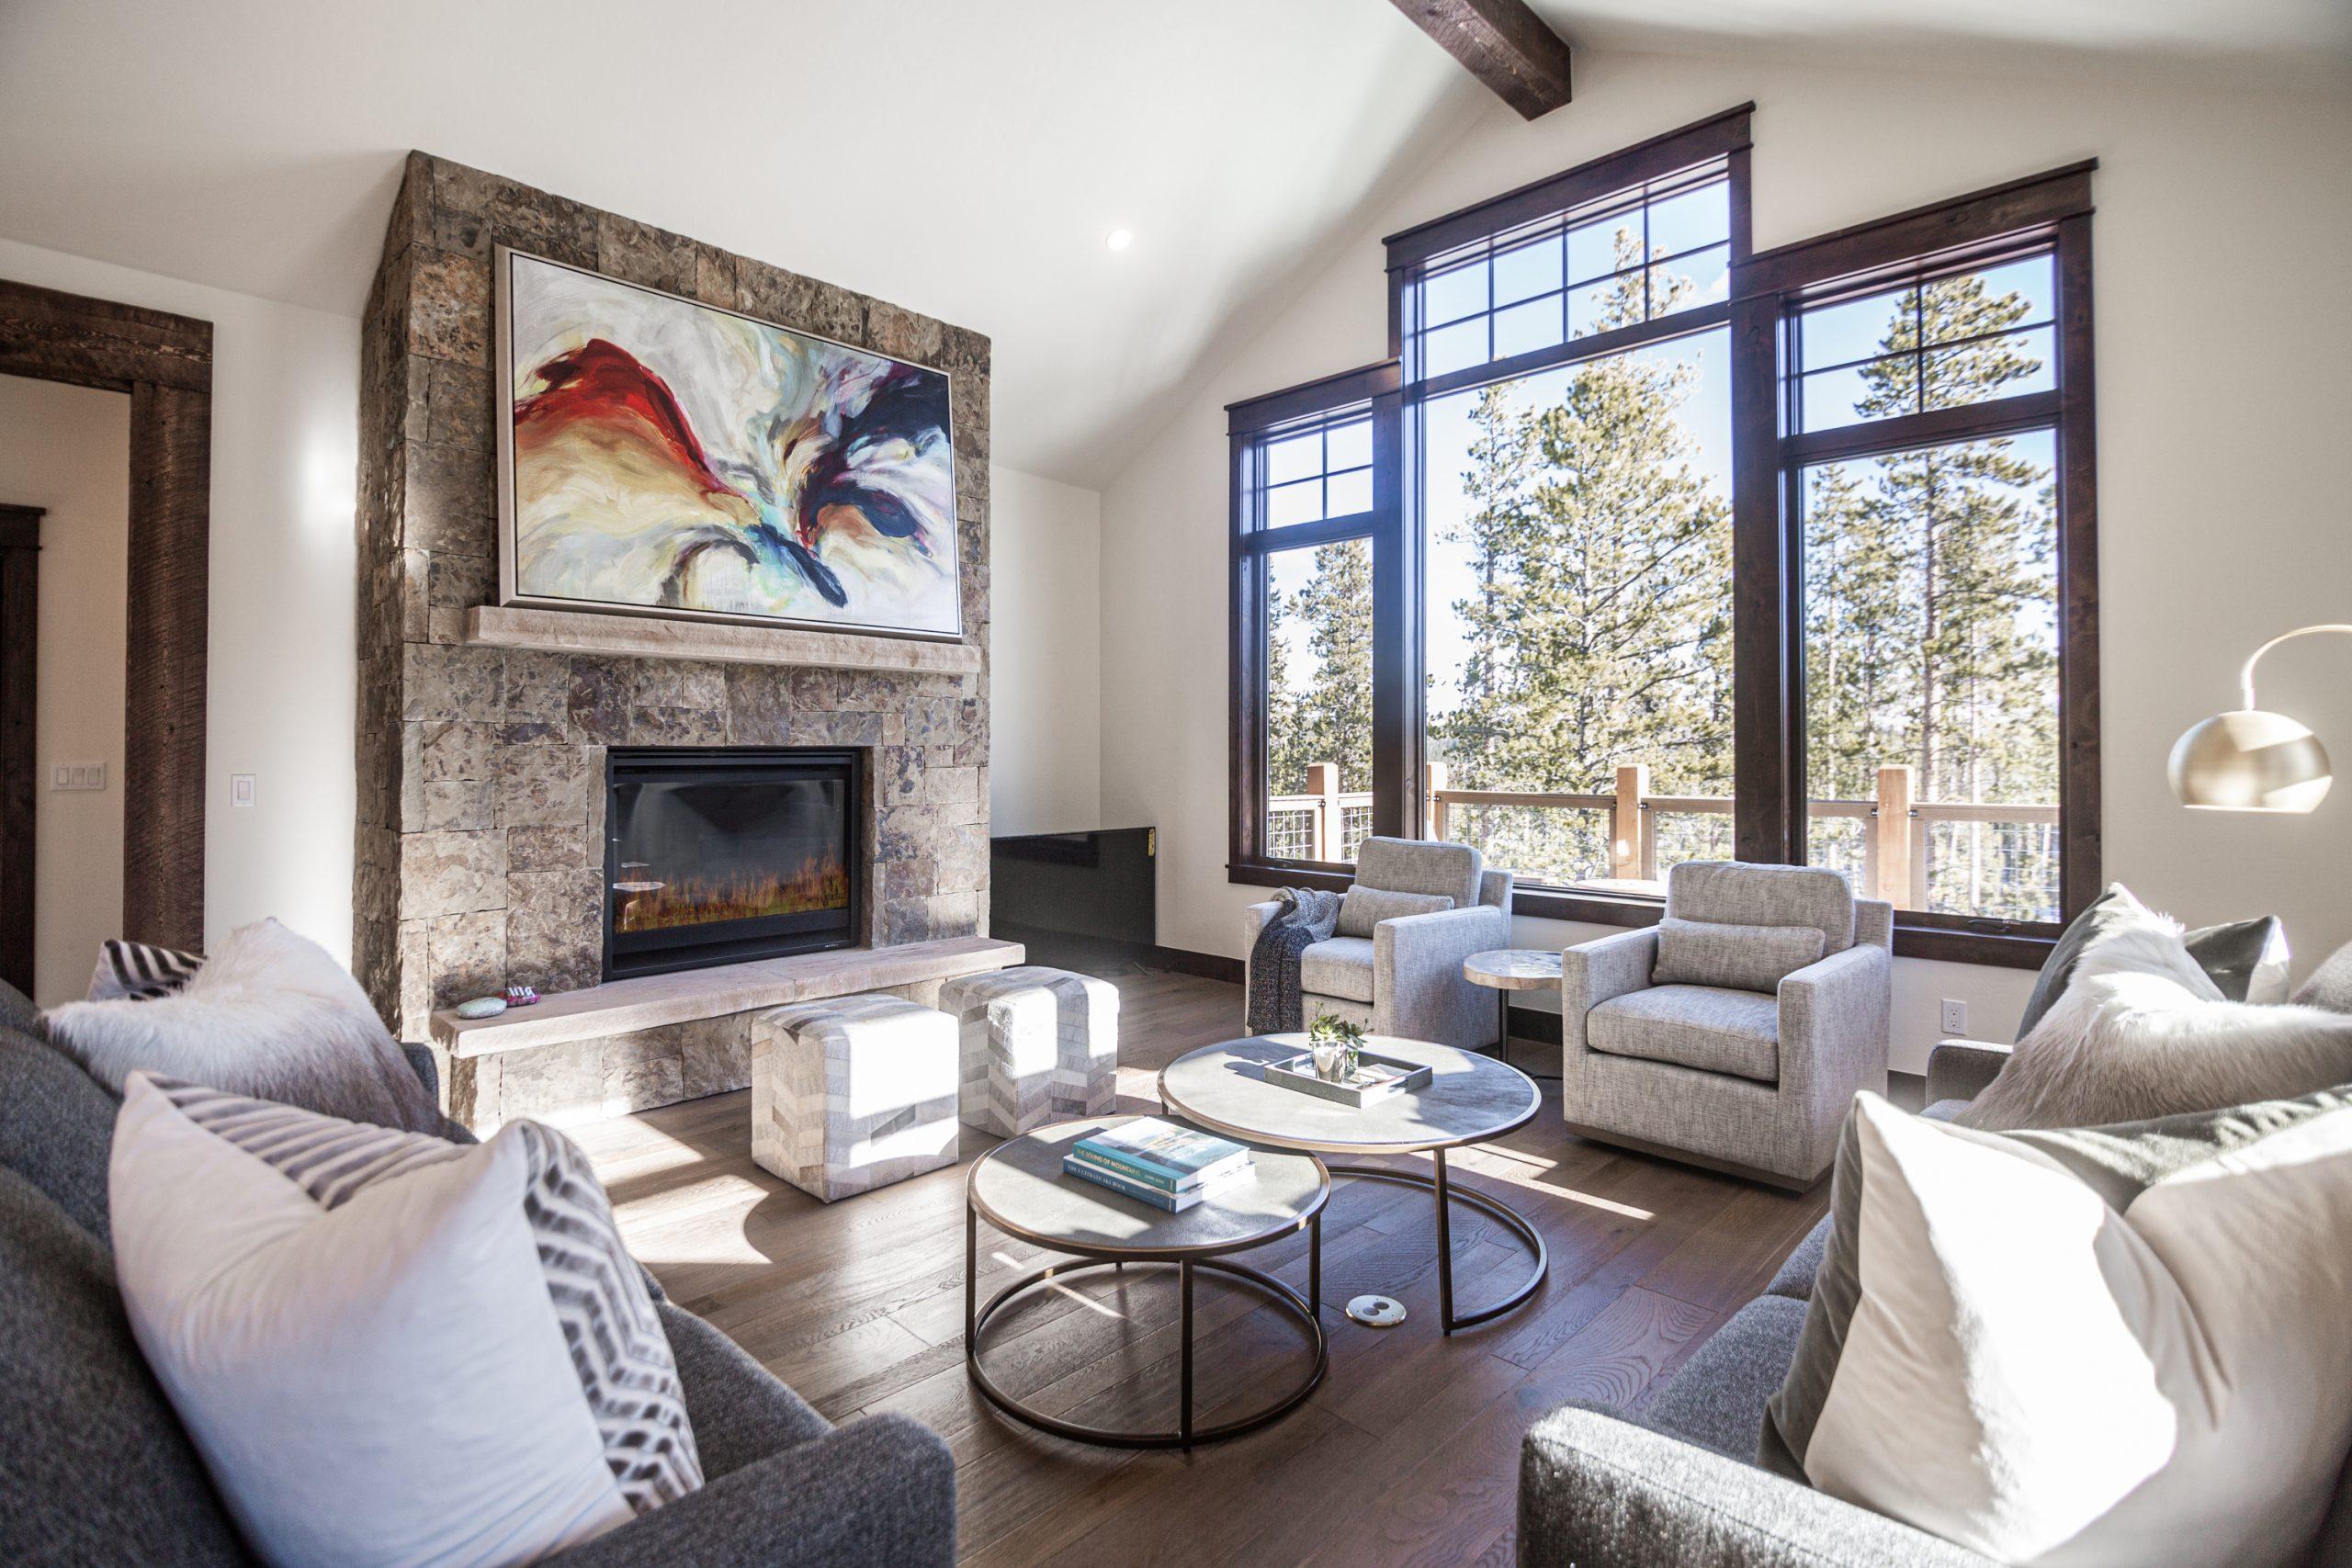 Easy Interior Design Improvements for your Breckenridge Vacation Rental